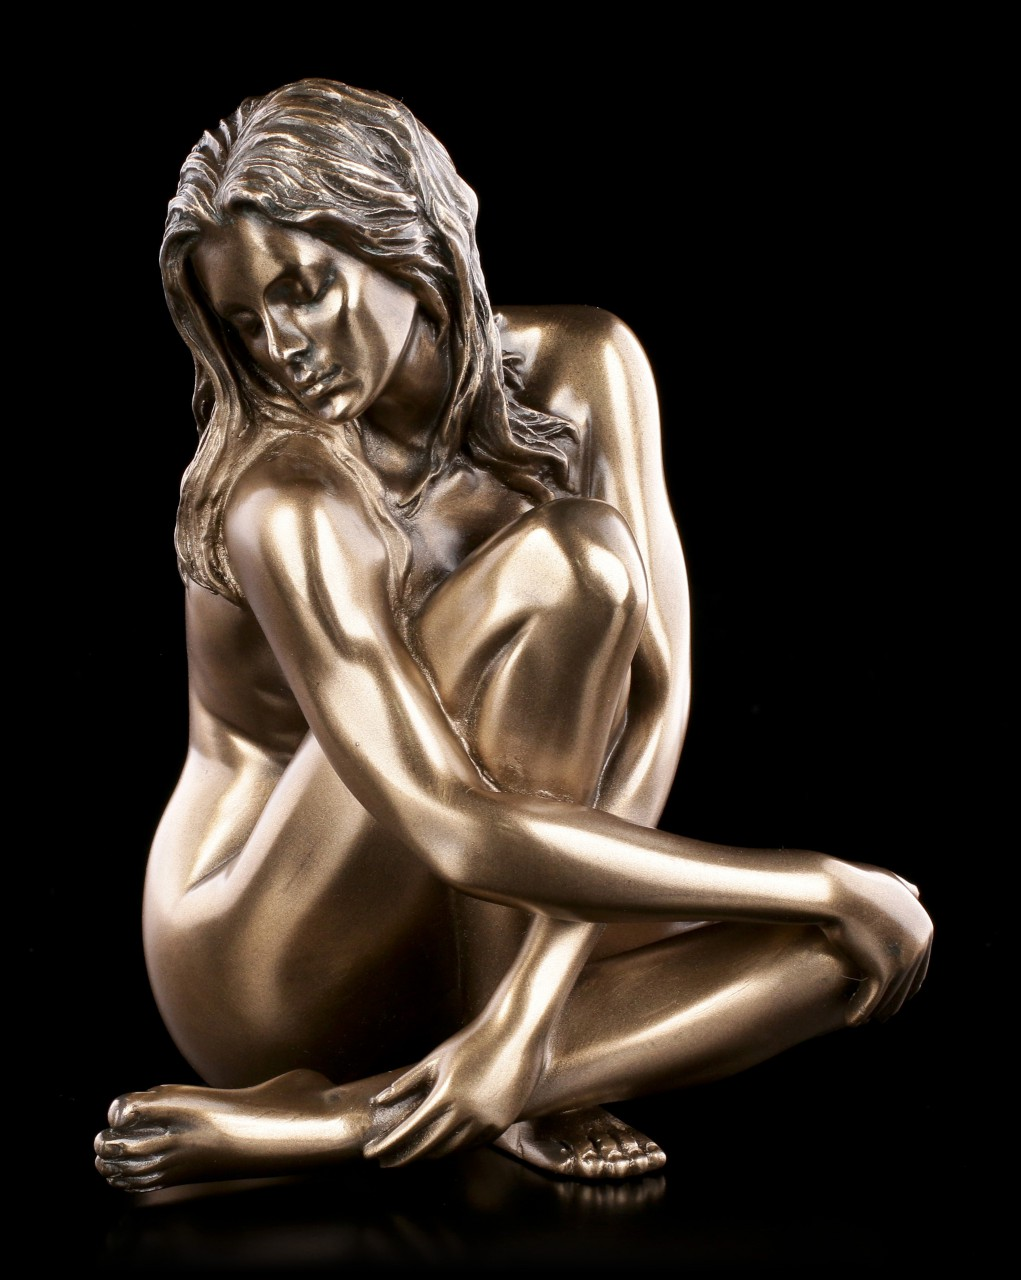 Female Nude Figurine - Recollection